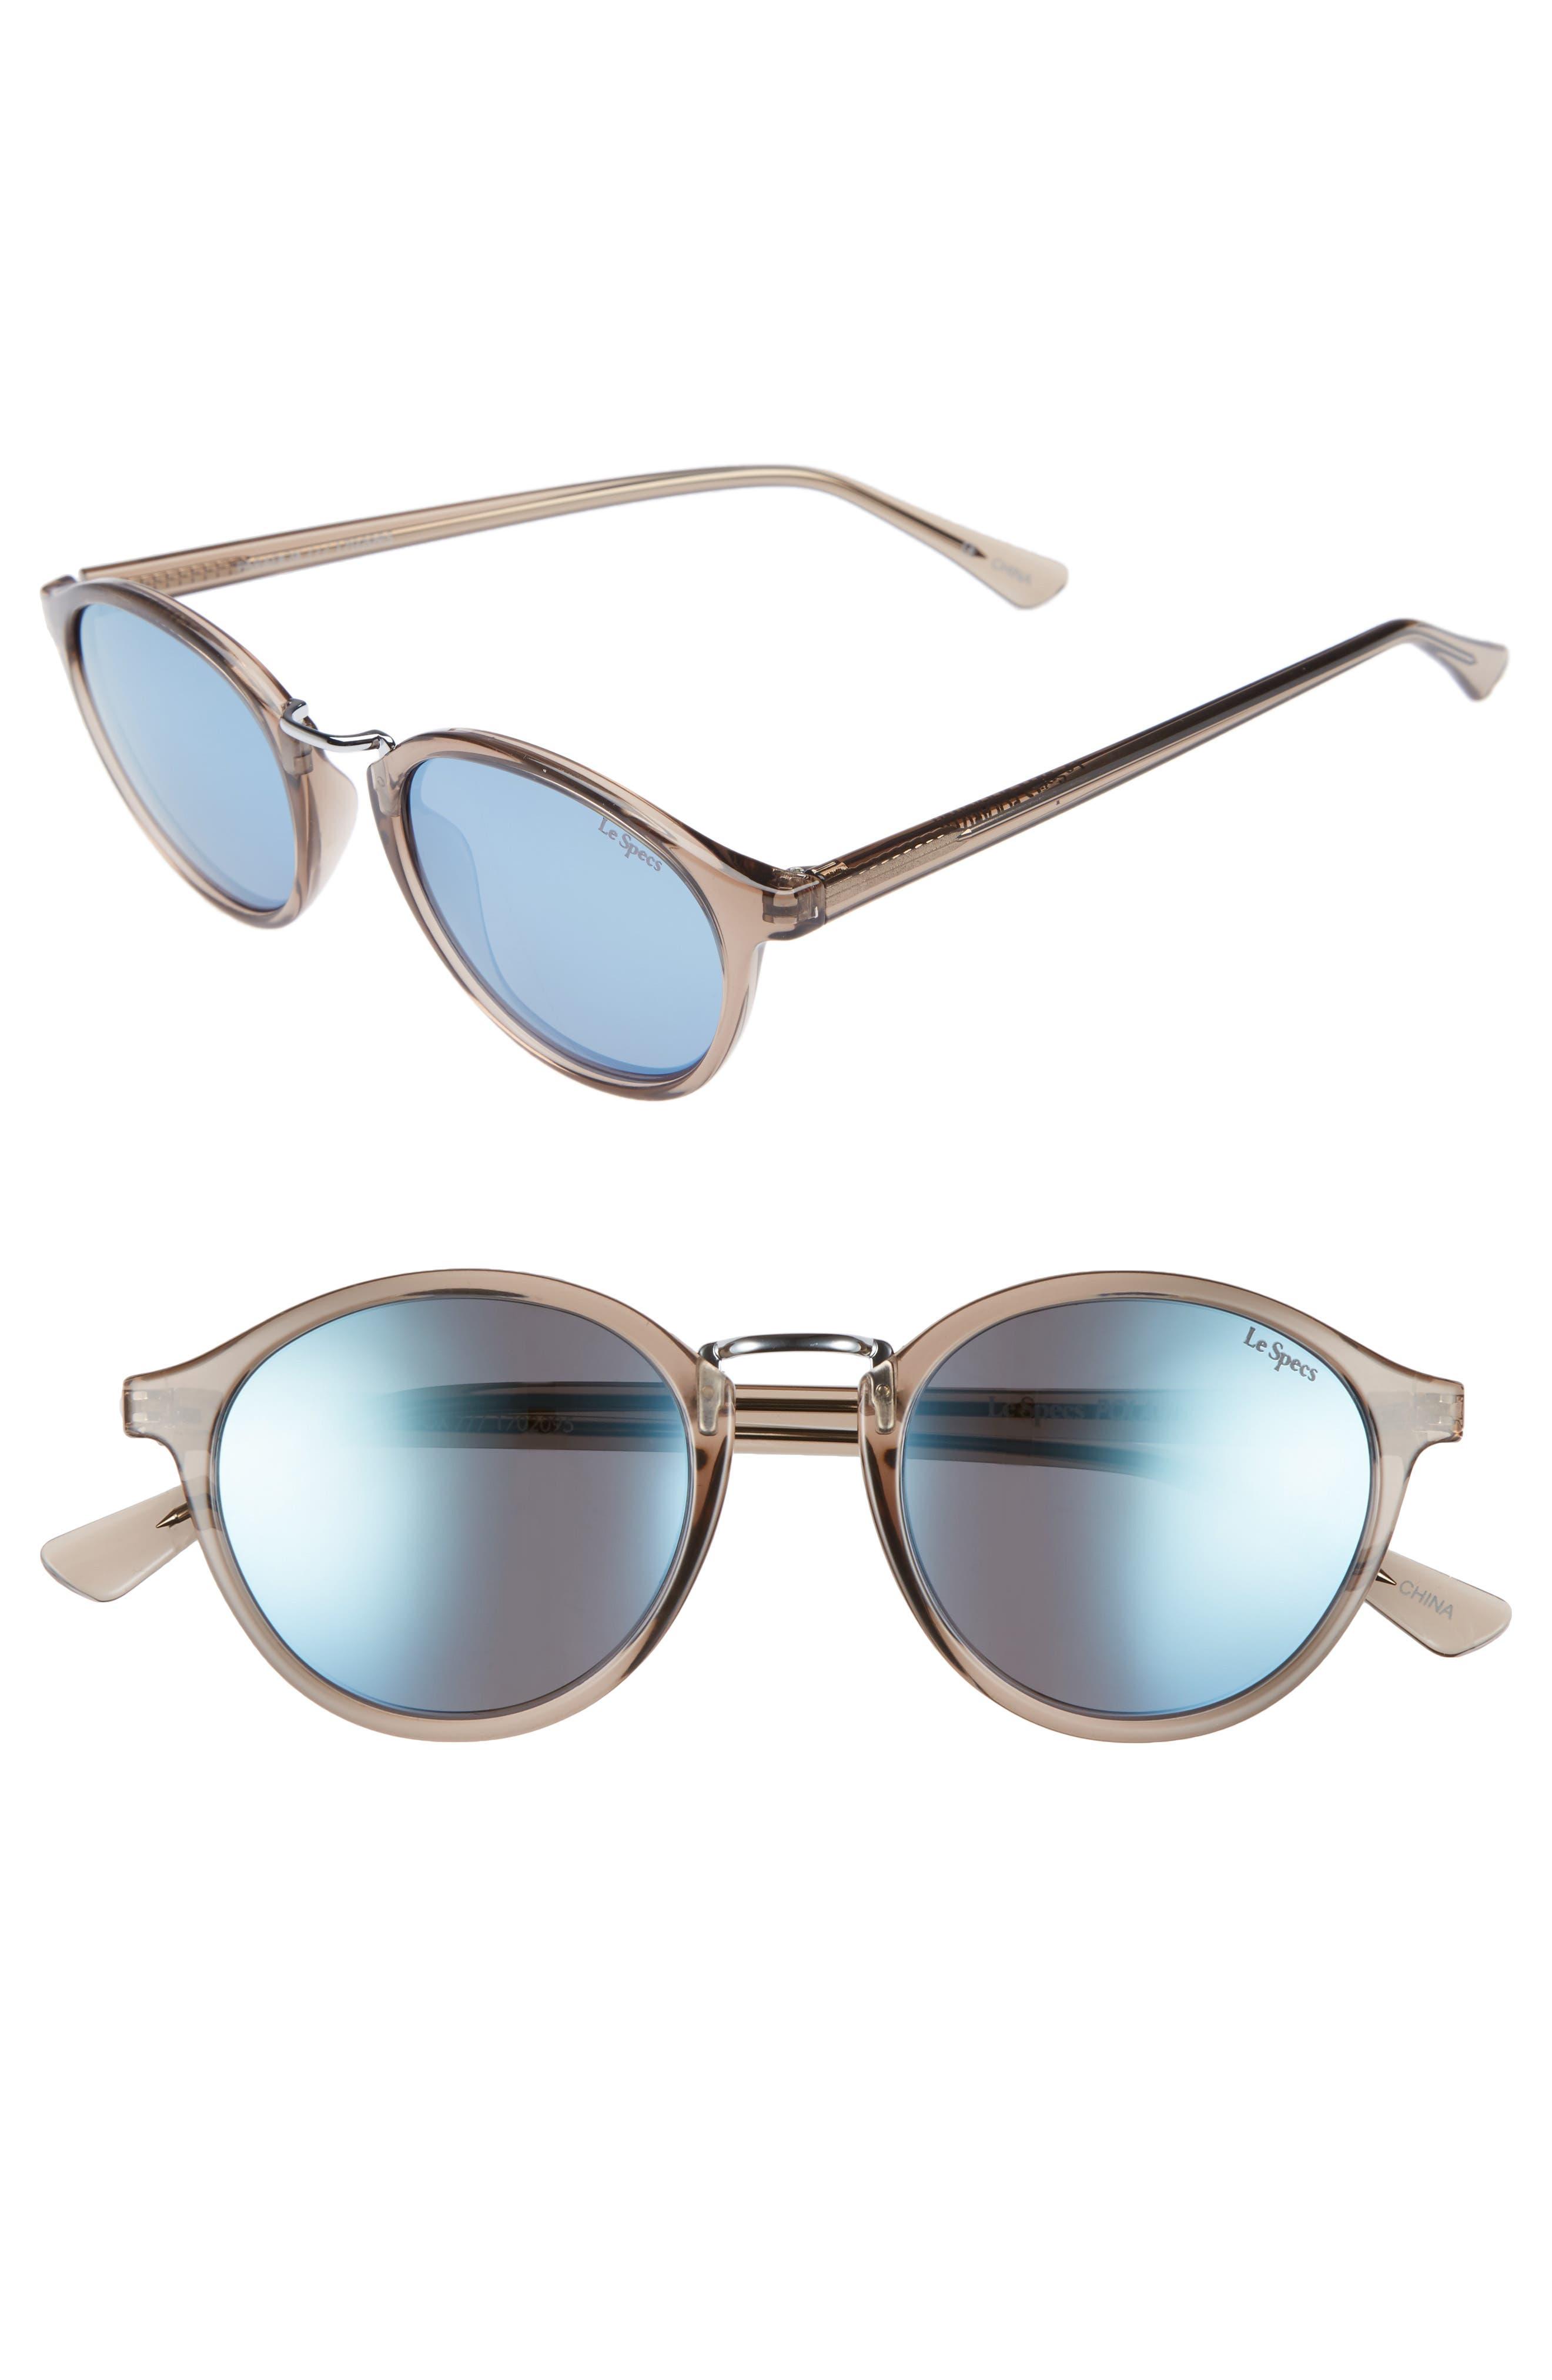 Main Image - Le Specs Paradox 49mm Oval Sunglasses